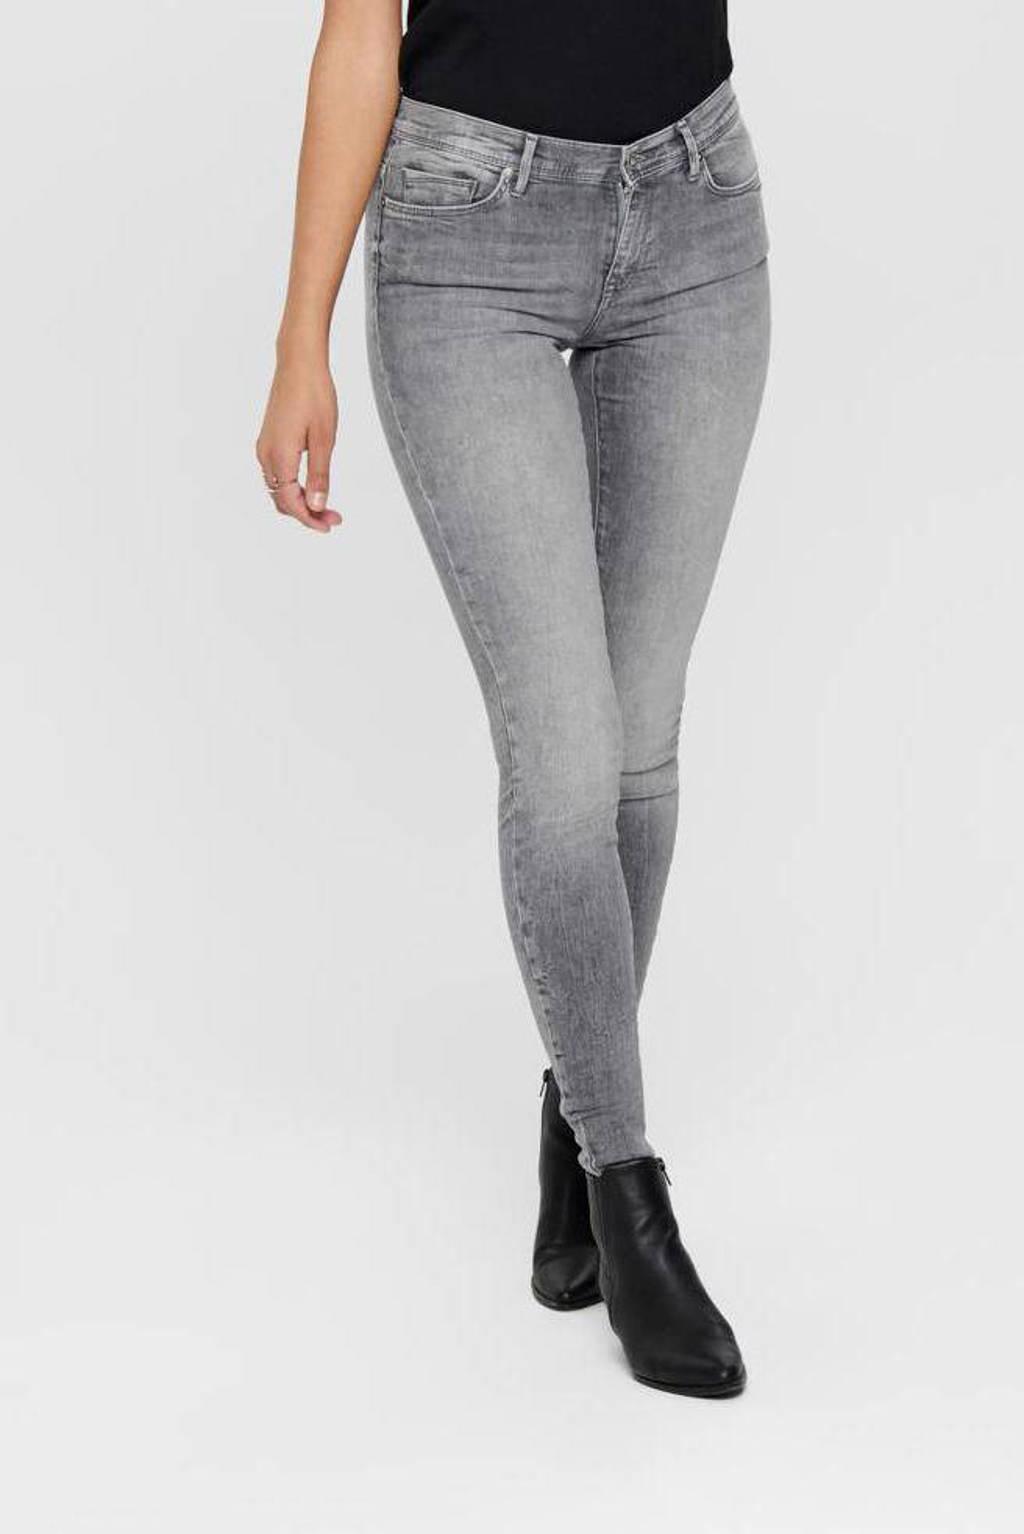 ONLY skinny jeans ONLSHAPE grey denim, Grijs